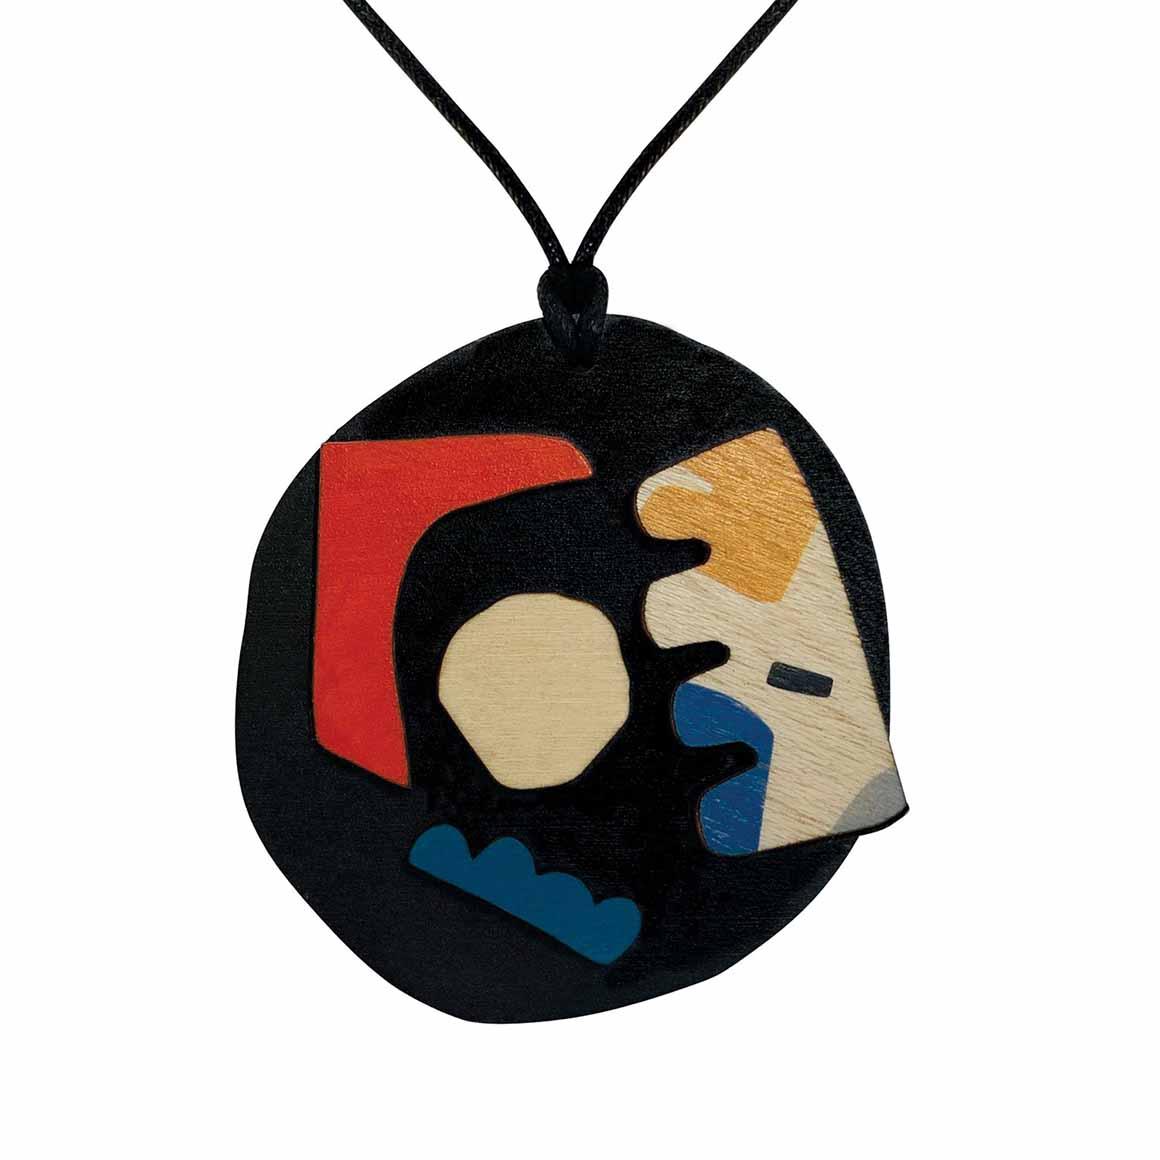 Abstract pendant on black   Trada Marketplace